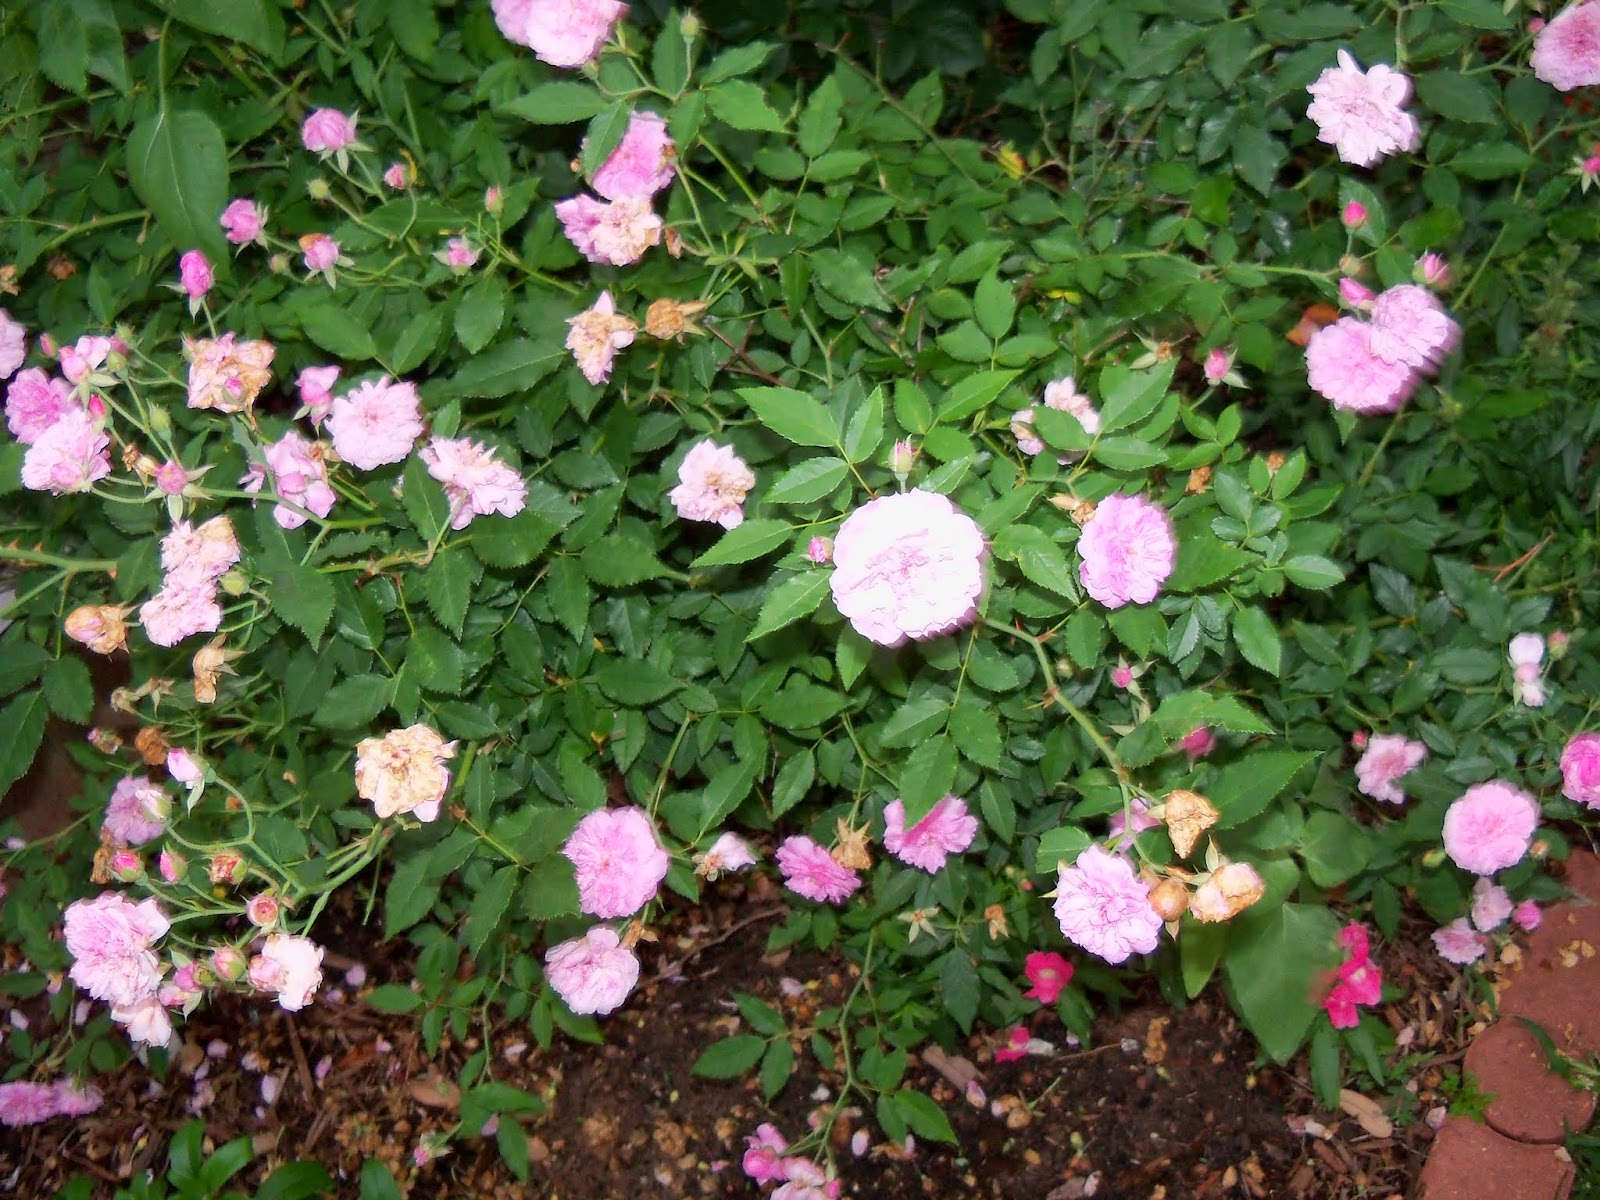 Gardening 2014 - 116_1978.JPG